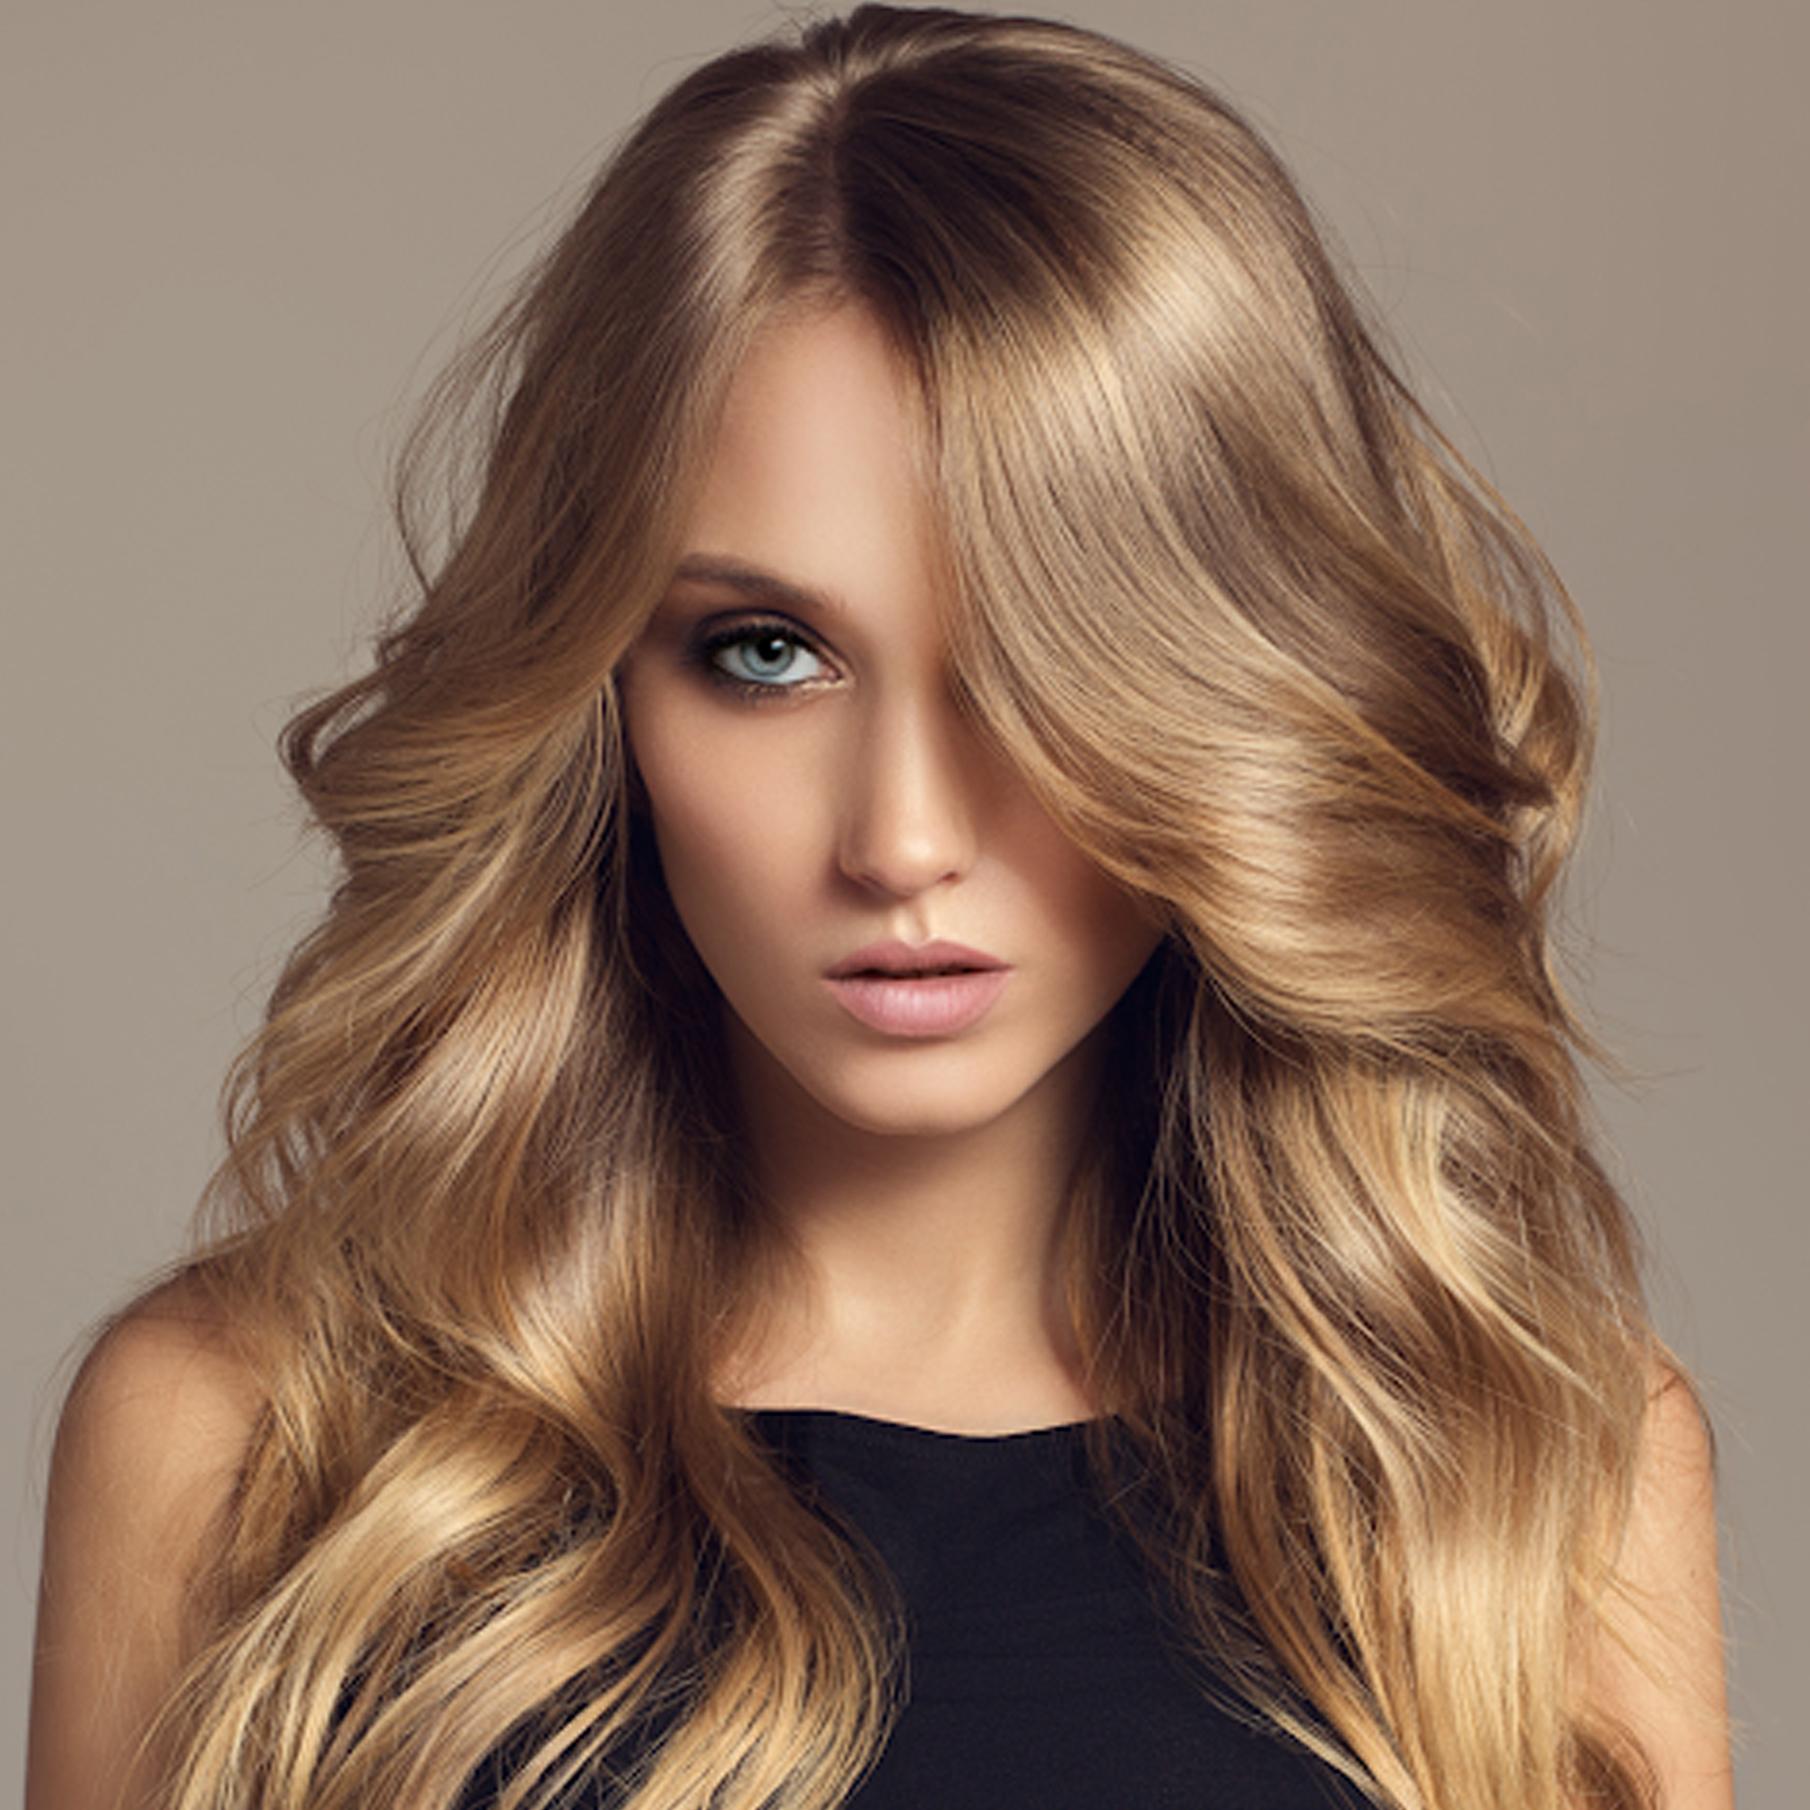 کدام ویتامین ها به رشد سریع تر مو کمک میکنند؟